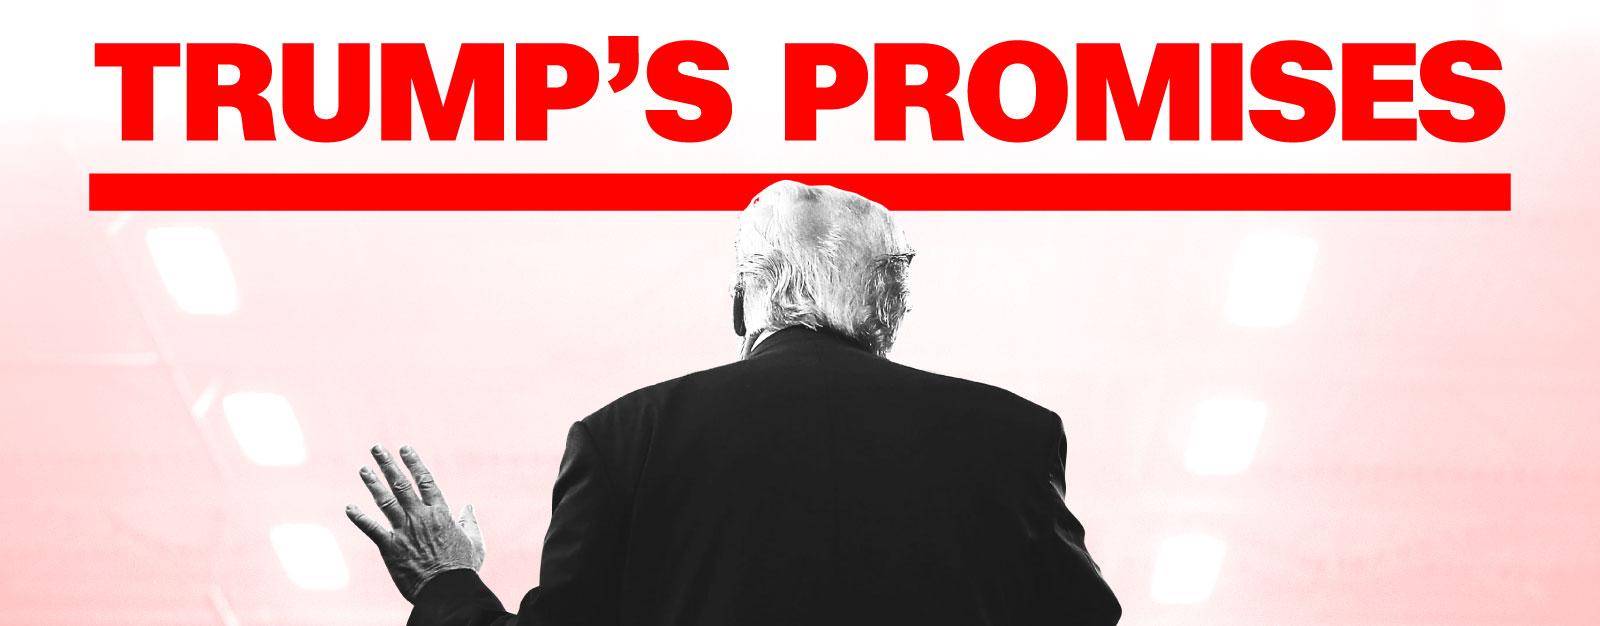 Tracking Trump's promises